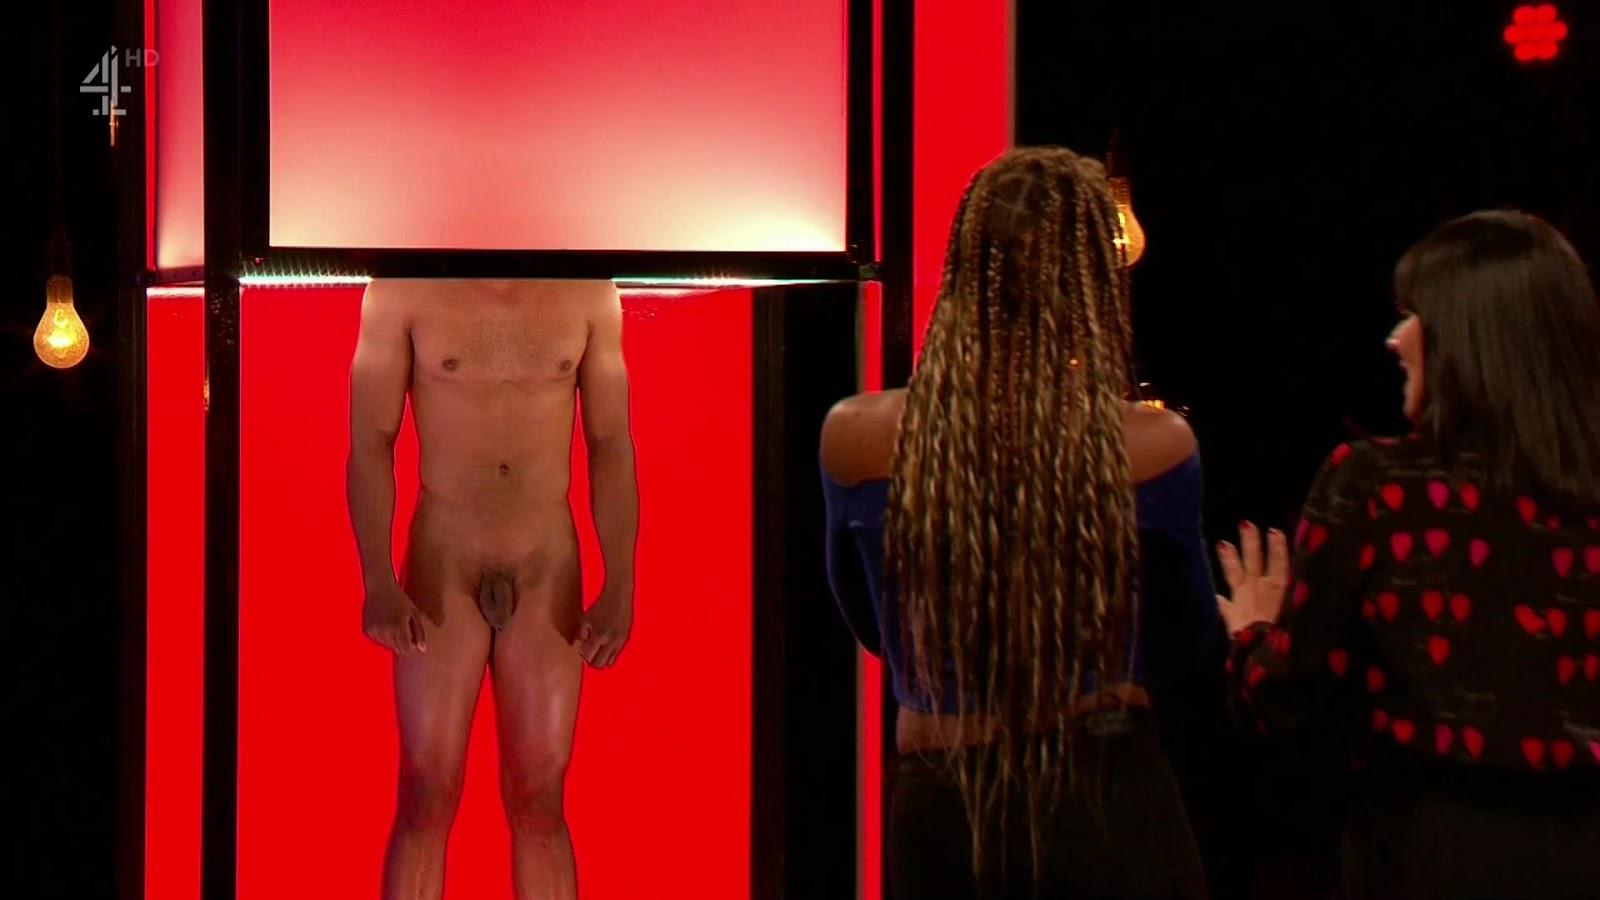 Andrew Biernat Recalls His Favorite Job, Explains Why He Won't Pose Nude